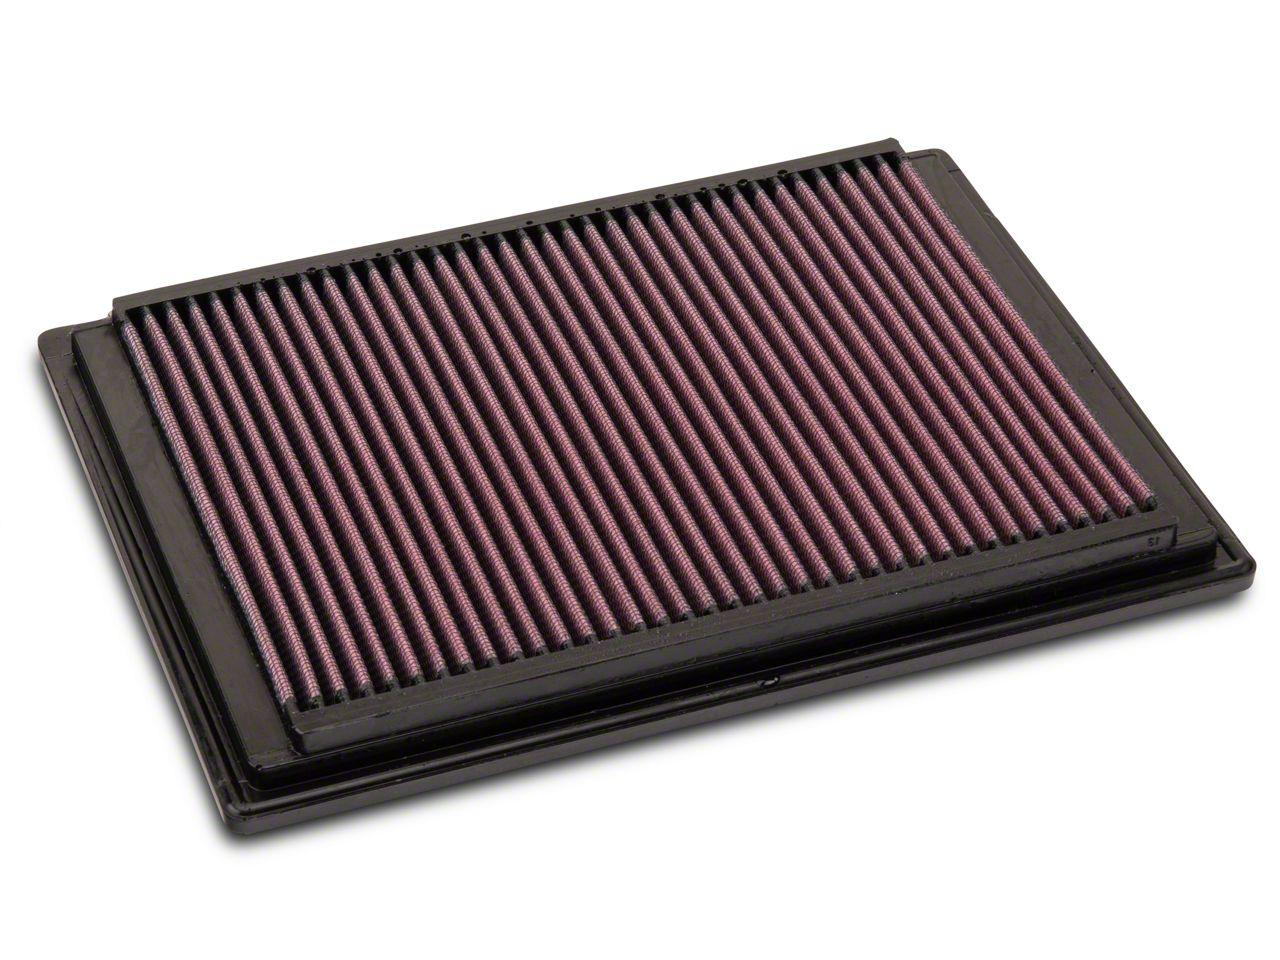 K&N Drop-In Replacement Air Filter (04-08 5.4L F-150)